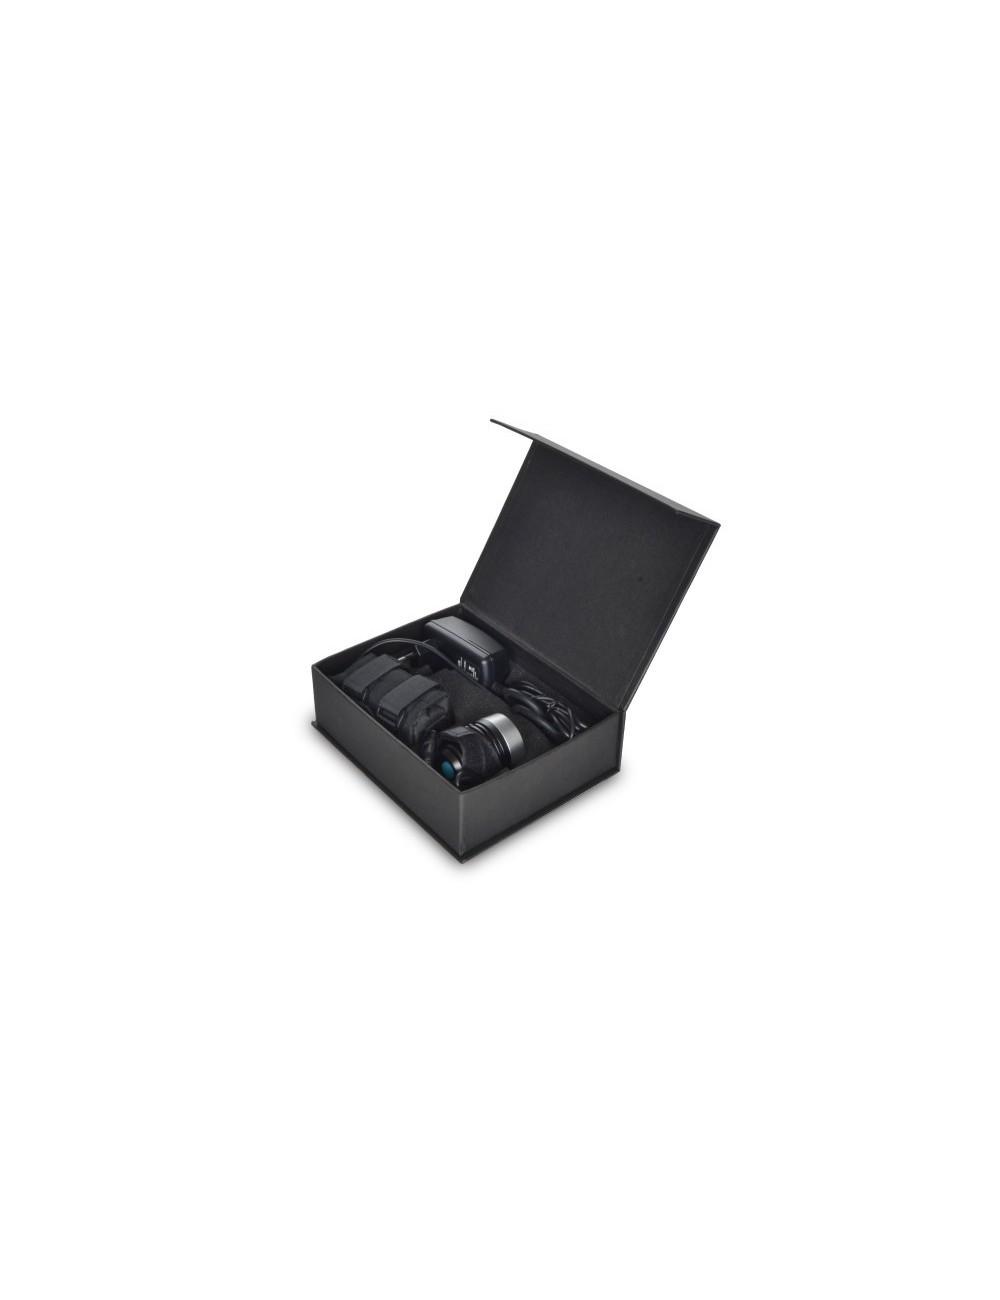 LUZ FRENTE OZONE USB OZ-300 (300 LUMENS)